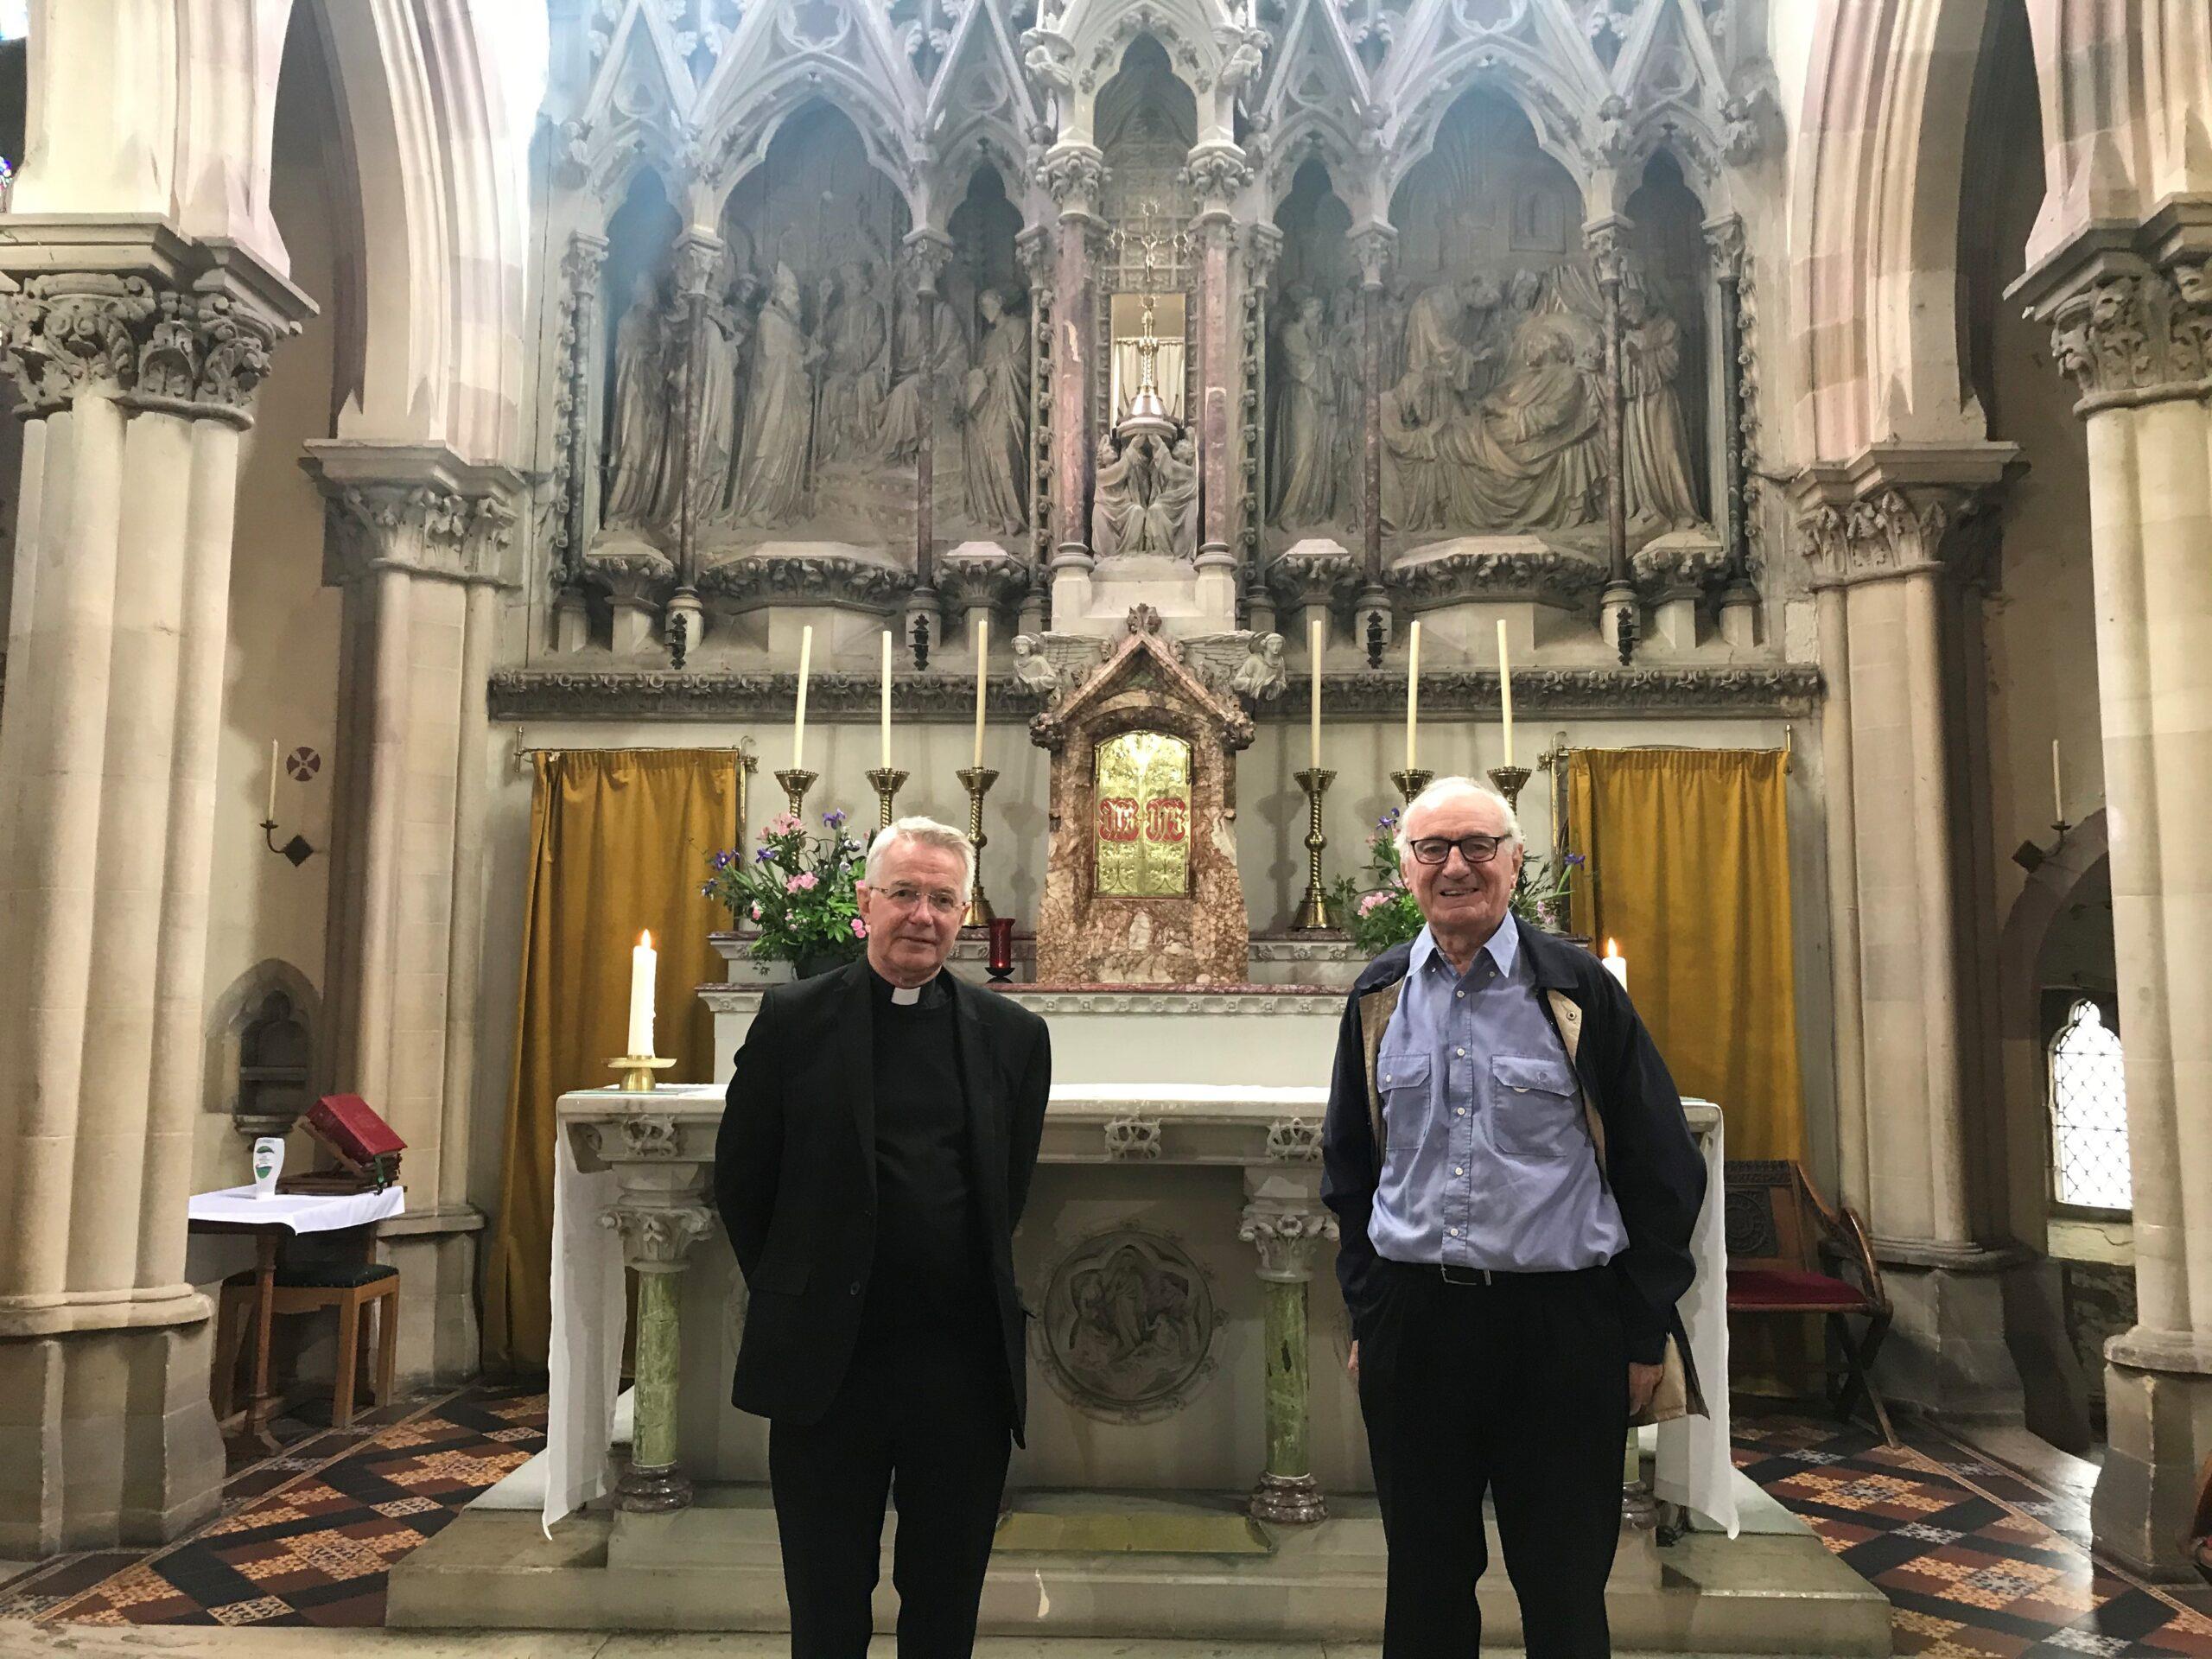 Ripon's St Wilfrid's church in line for £500,000 refurbishment